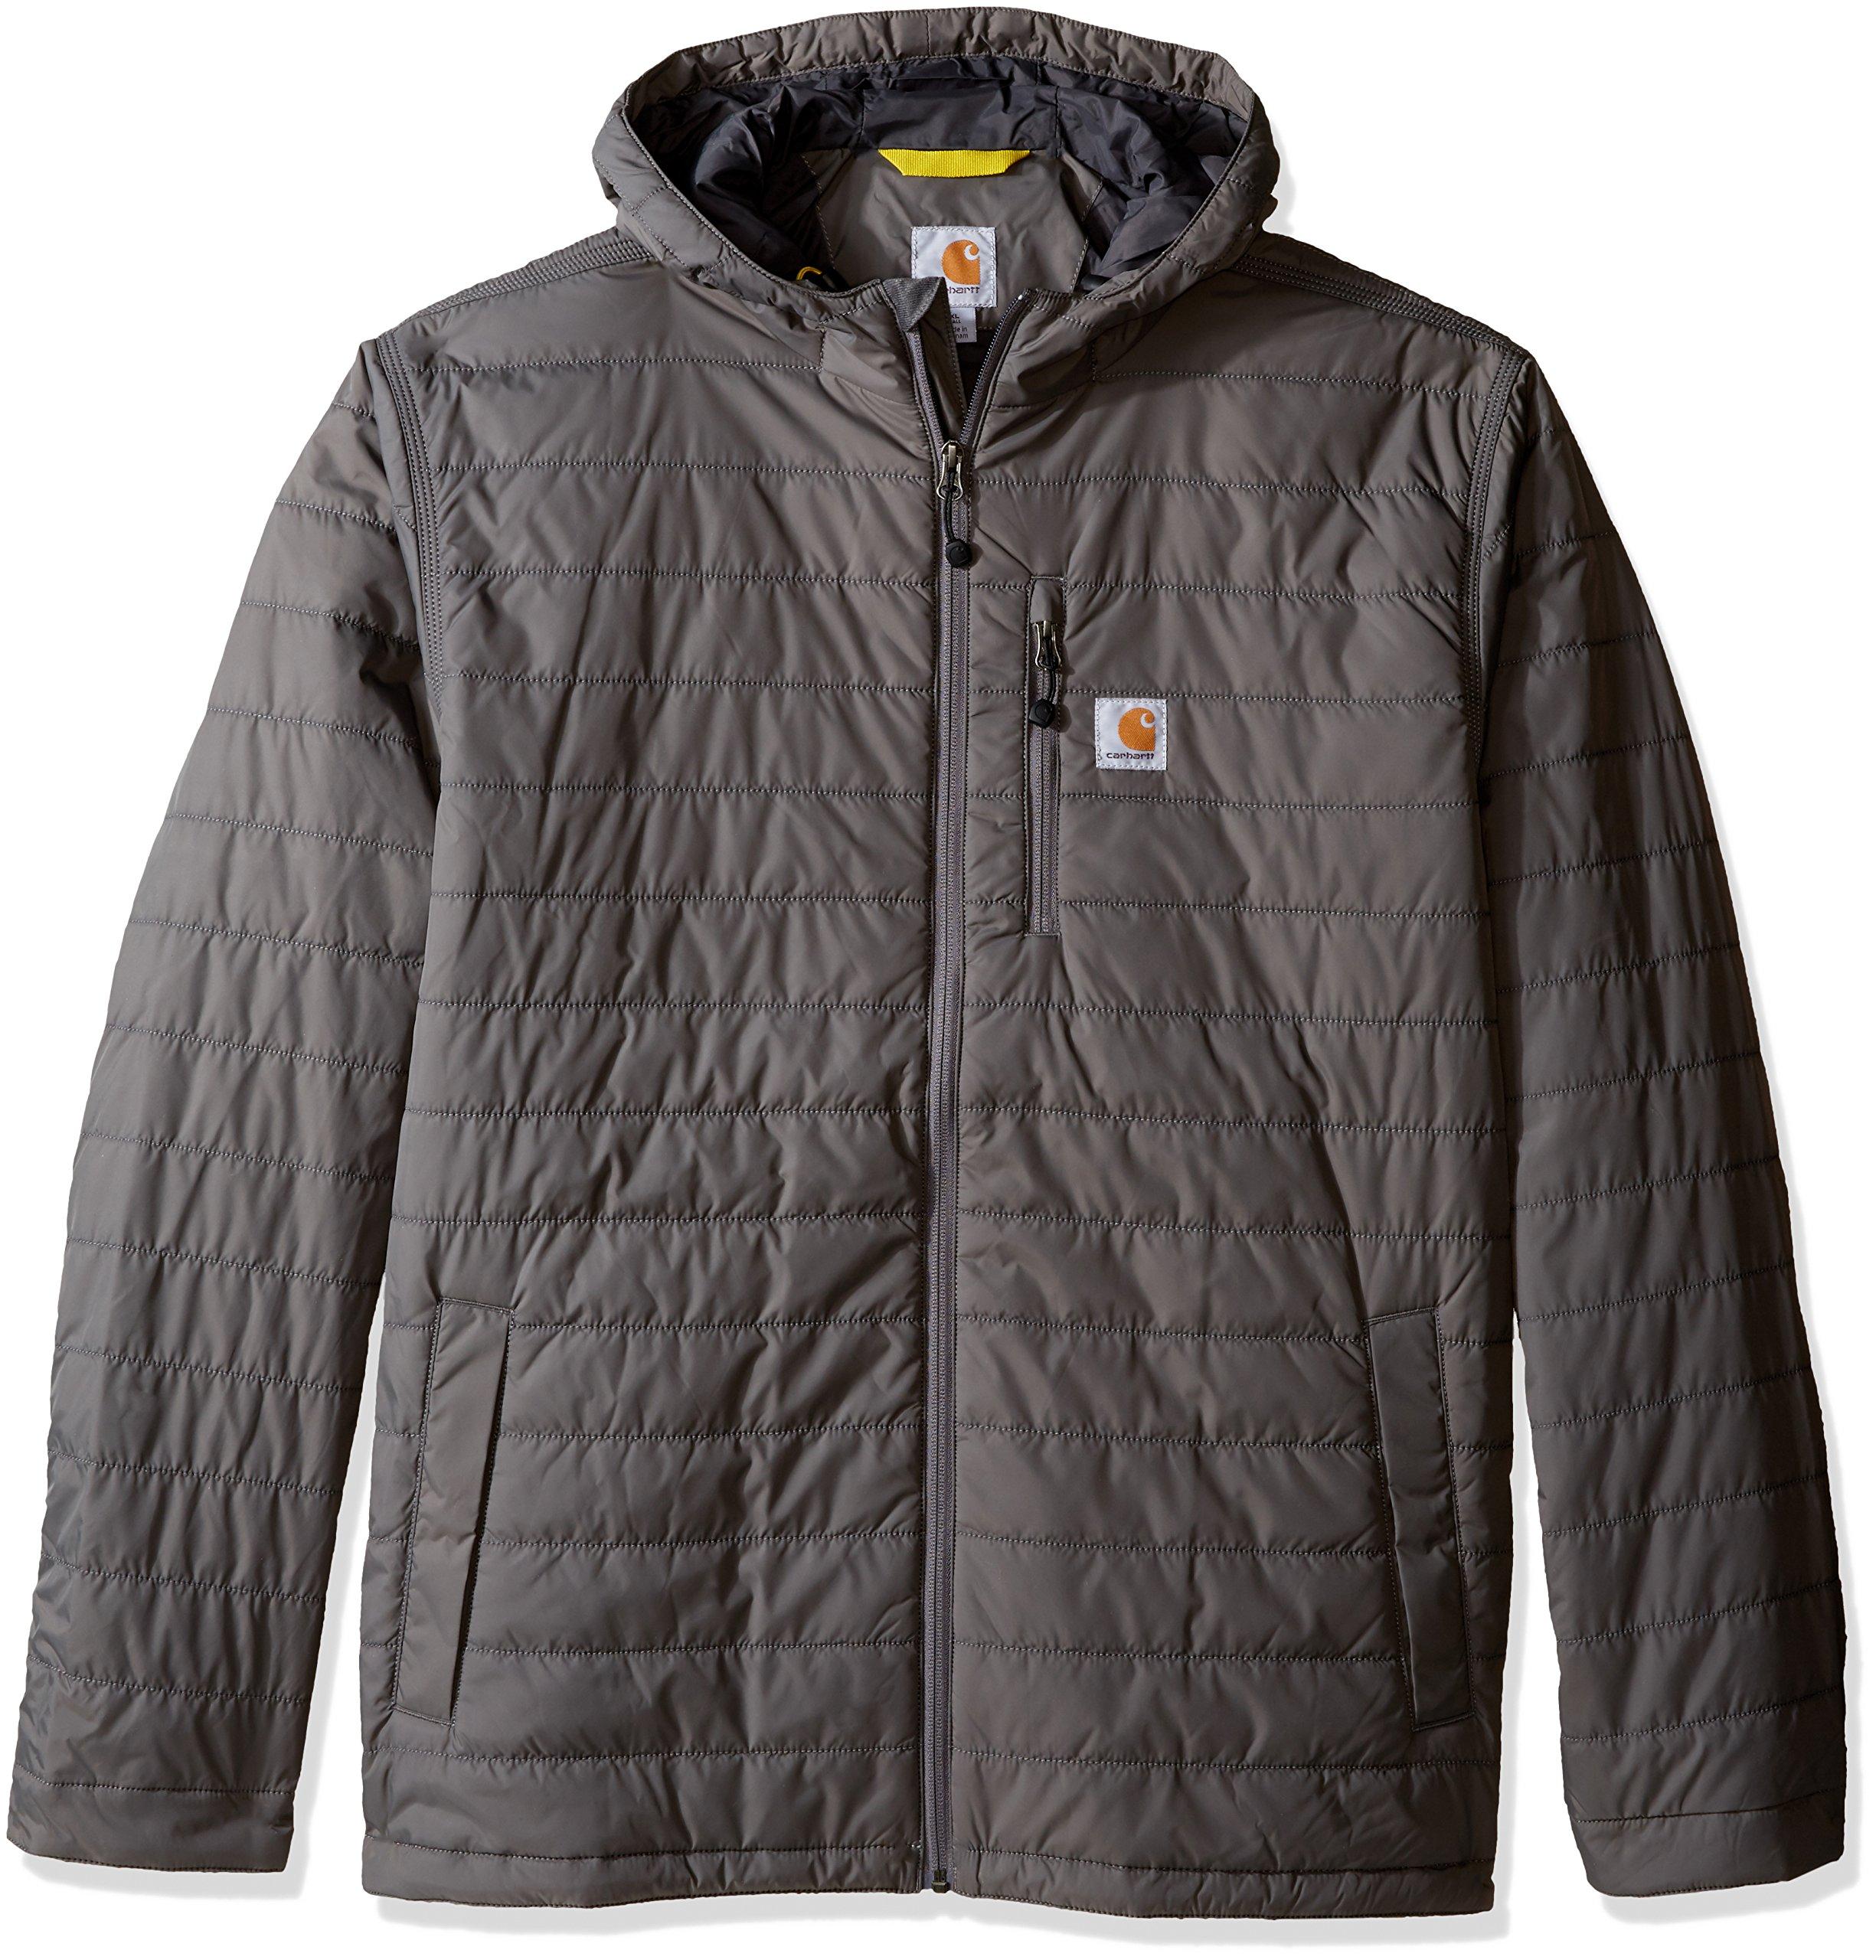 Carhartt Men's Big & Tall Gilliam Hooded Jacket, Gravel, X-Large/Tall by Carhartt